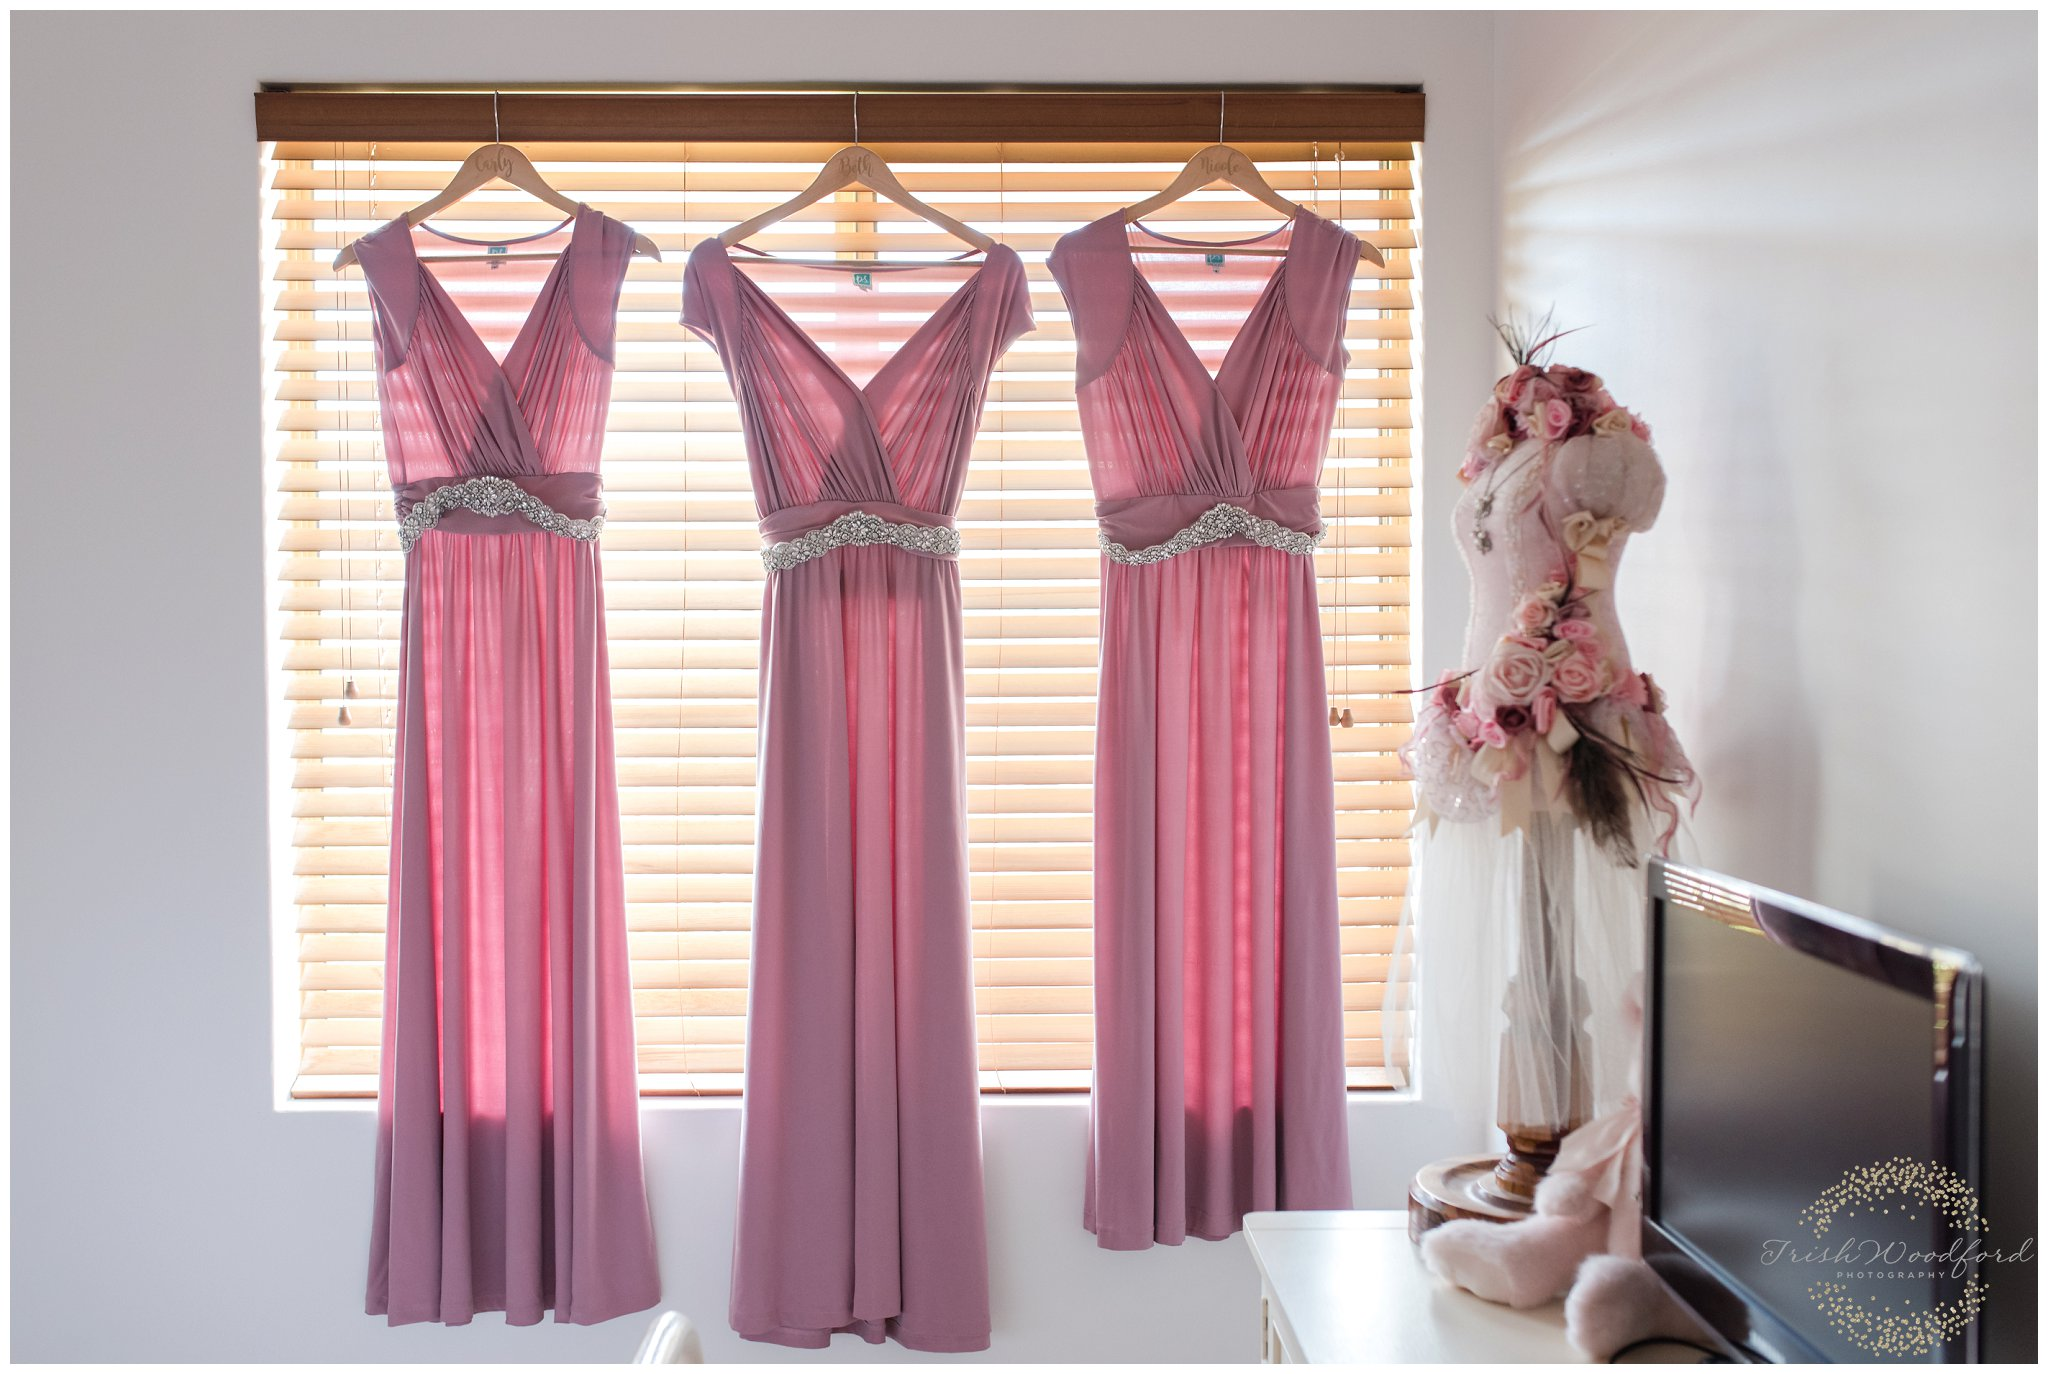 perth bridesmaid dresses